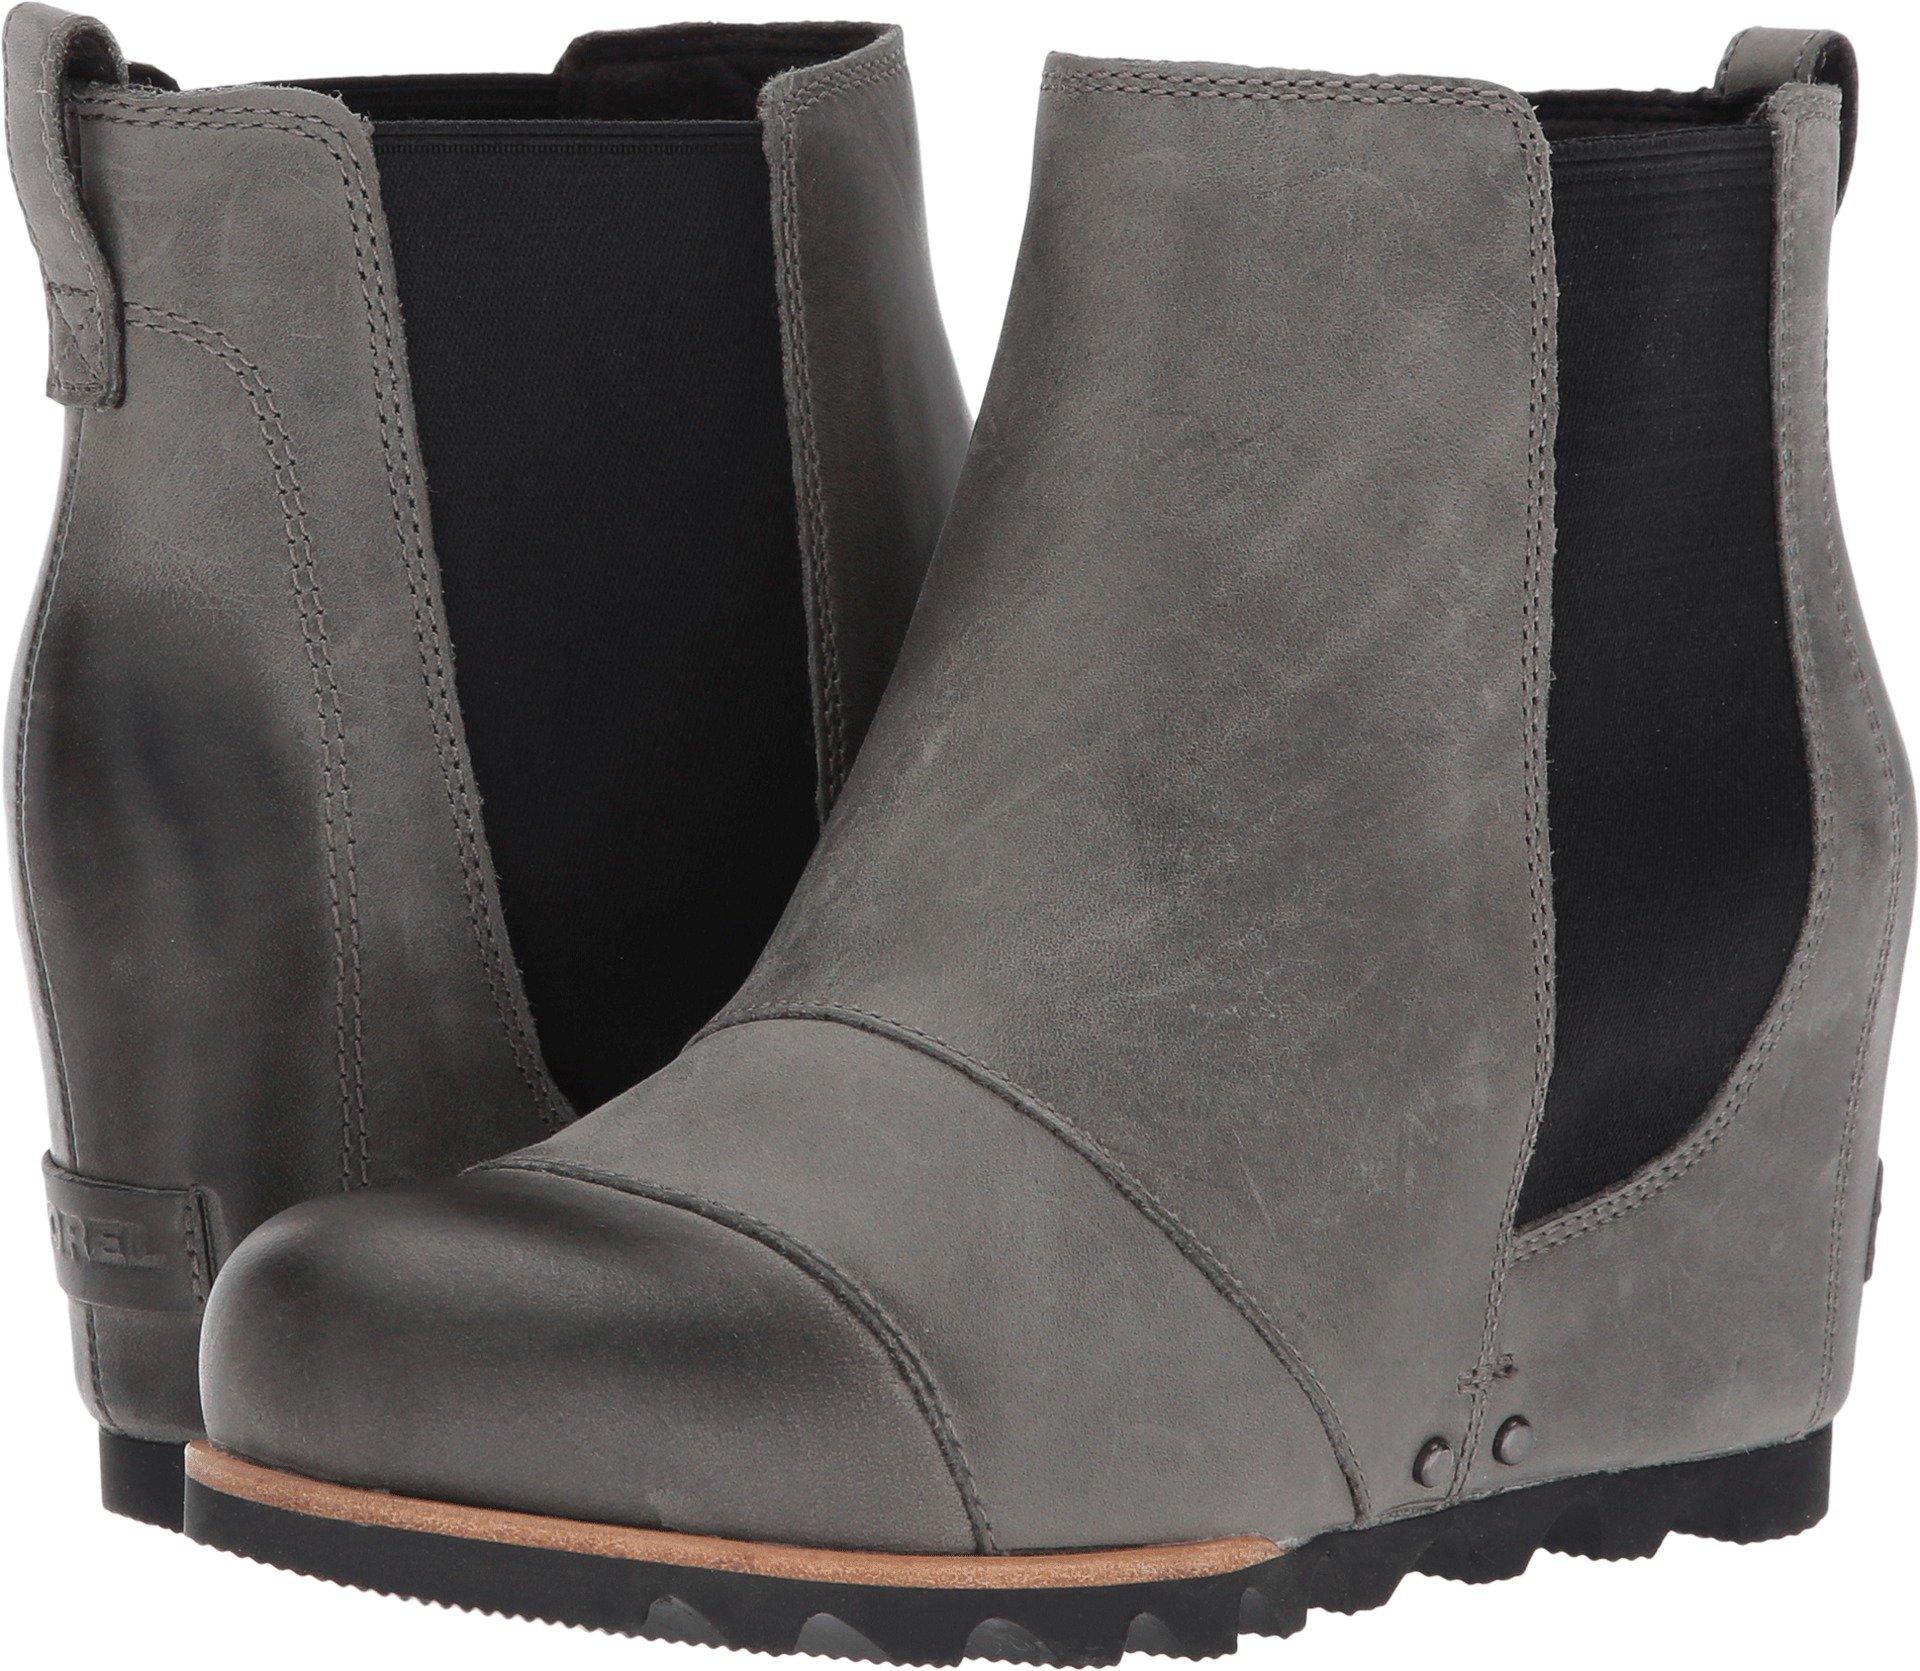 Sorel Women's Lea Wedge Booties (8 B(M) US, Dark Grey/Black)